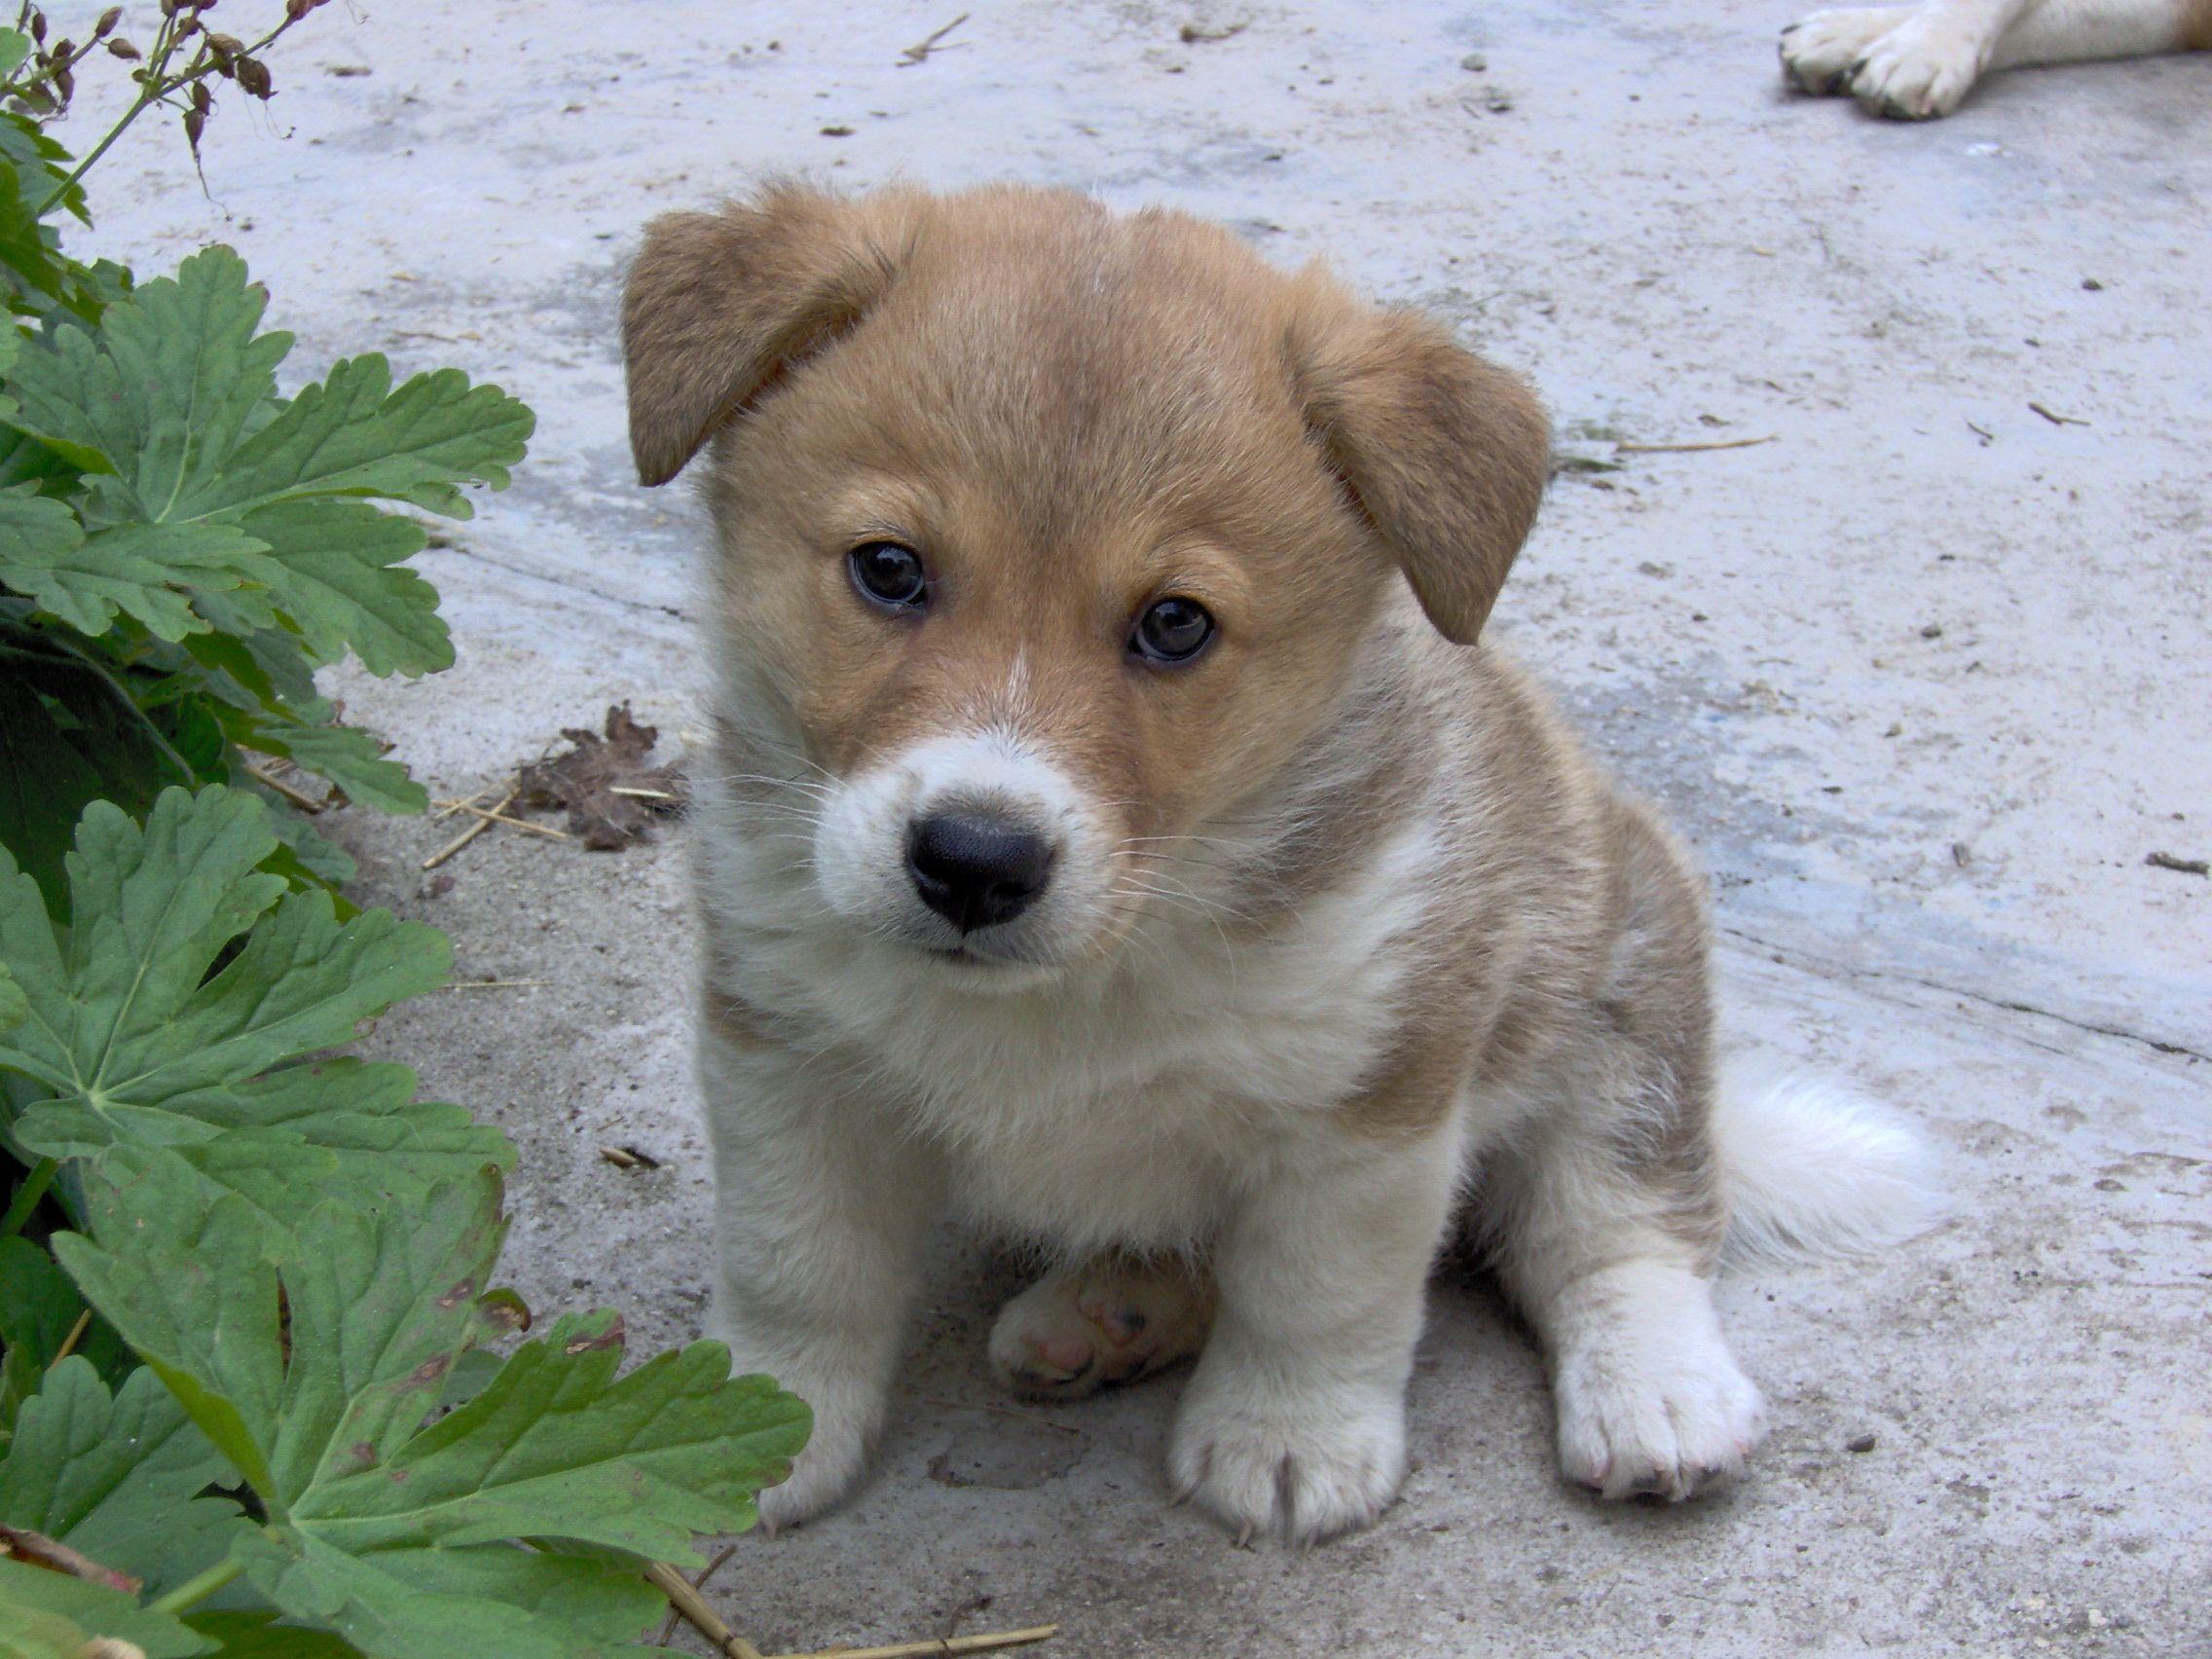 A cute little dog, Animal, Bspo06, Cute, Dog, HQ Photo